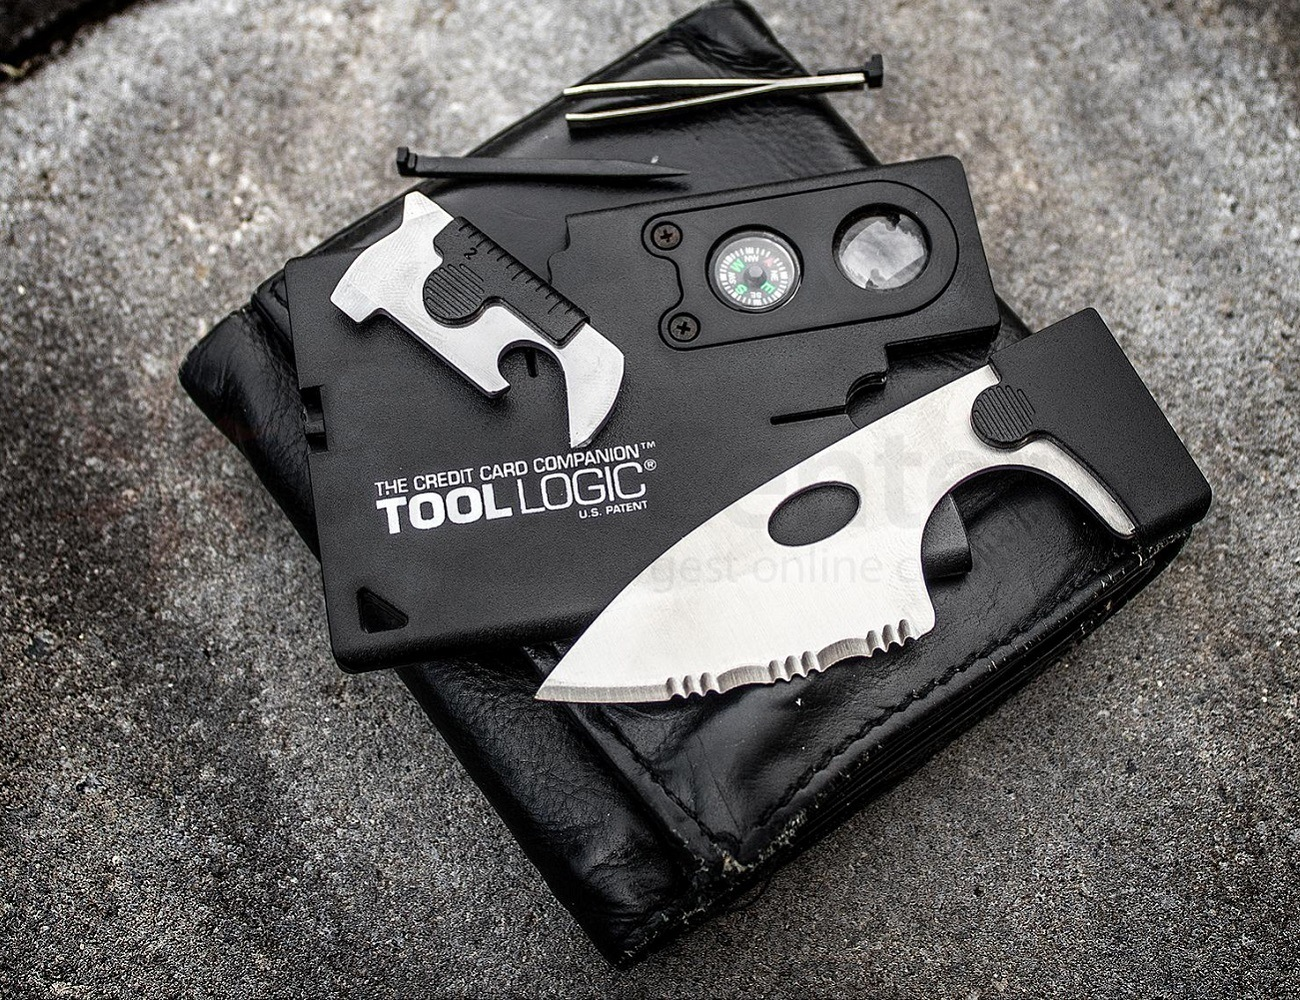 Tool Logic Credit Card Companion